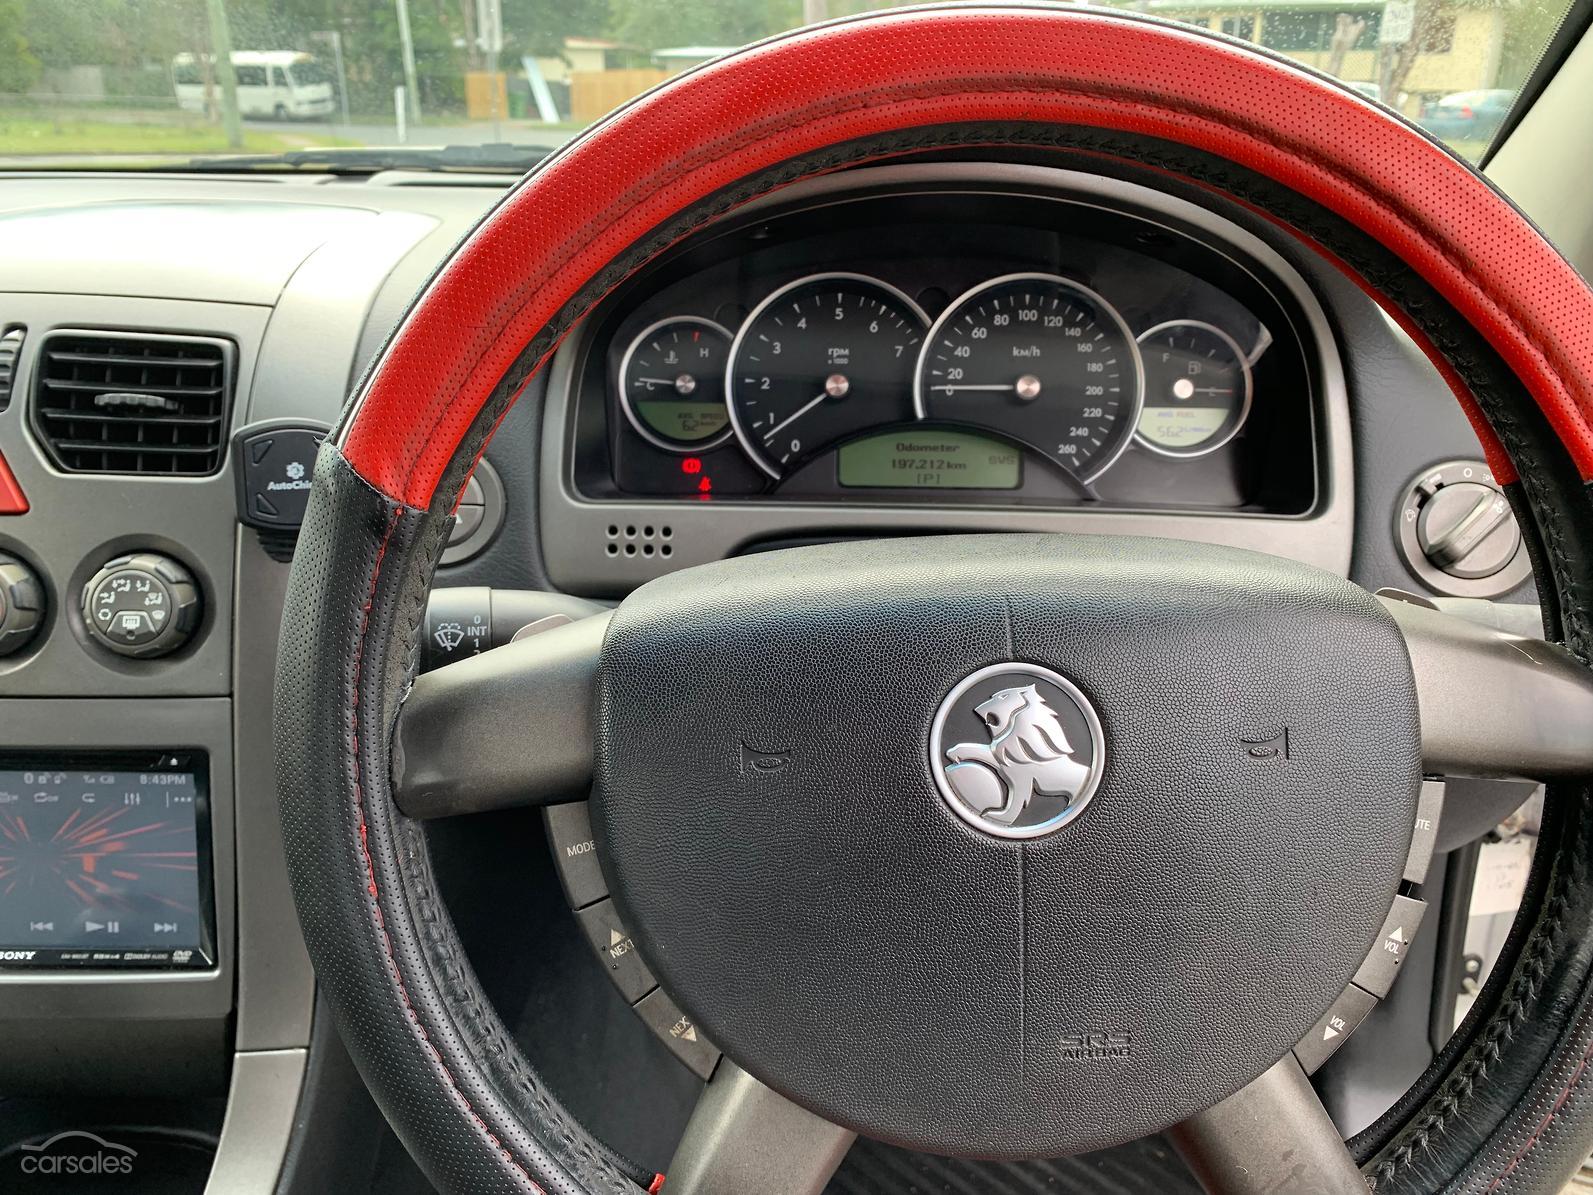 2005 Holden Commodore SV6 VZ Auto-SSE-AD-6121434 - carsales com au